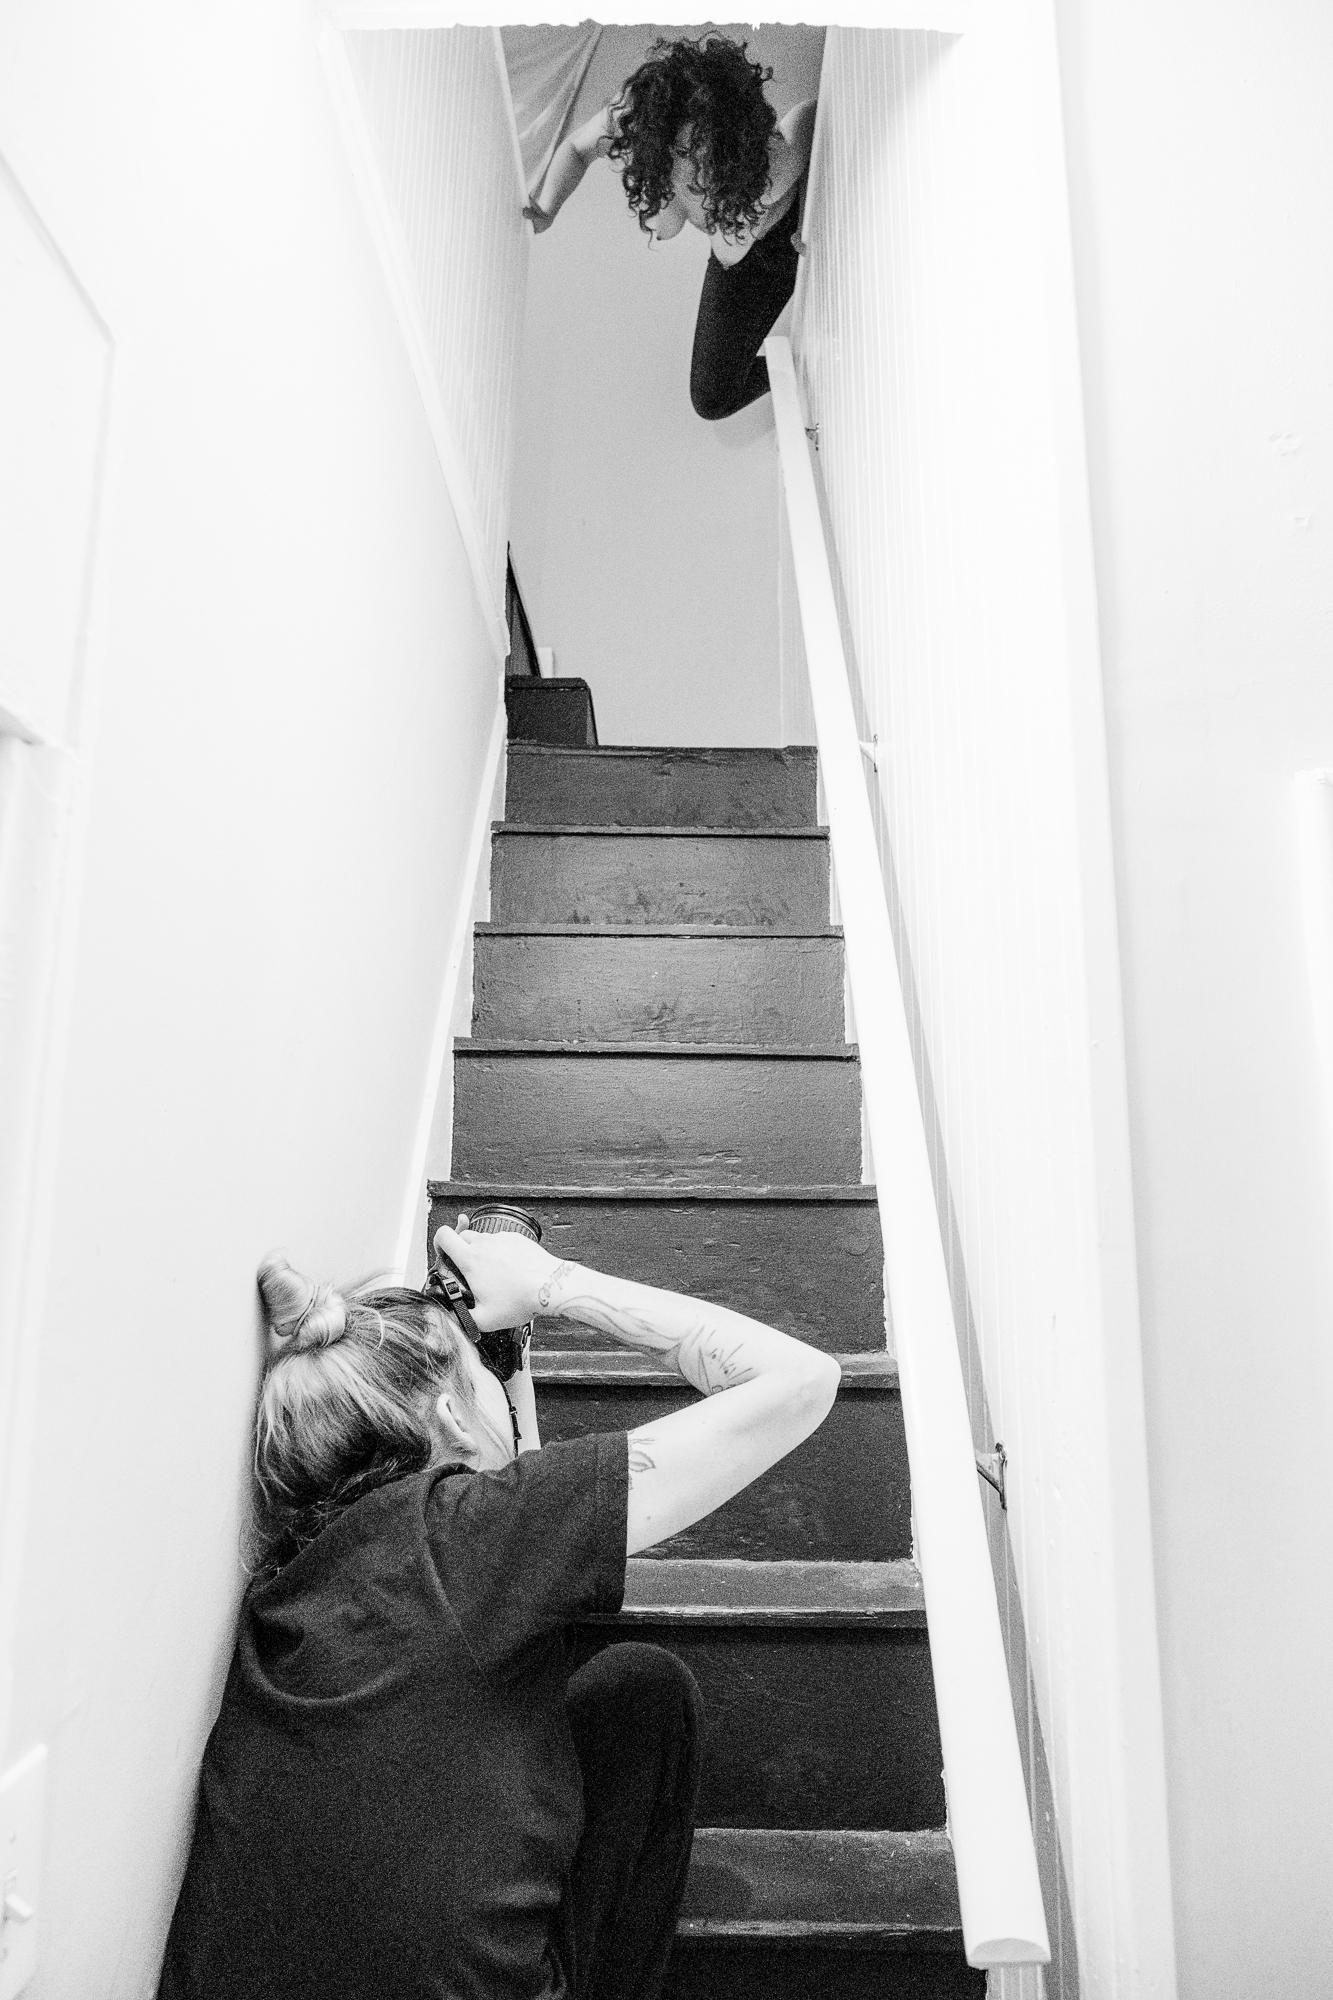 20181128-Brandi-Hannah-apartment-X-T2-0045-Edit.jpg